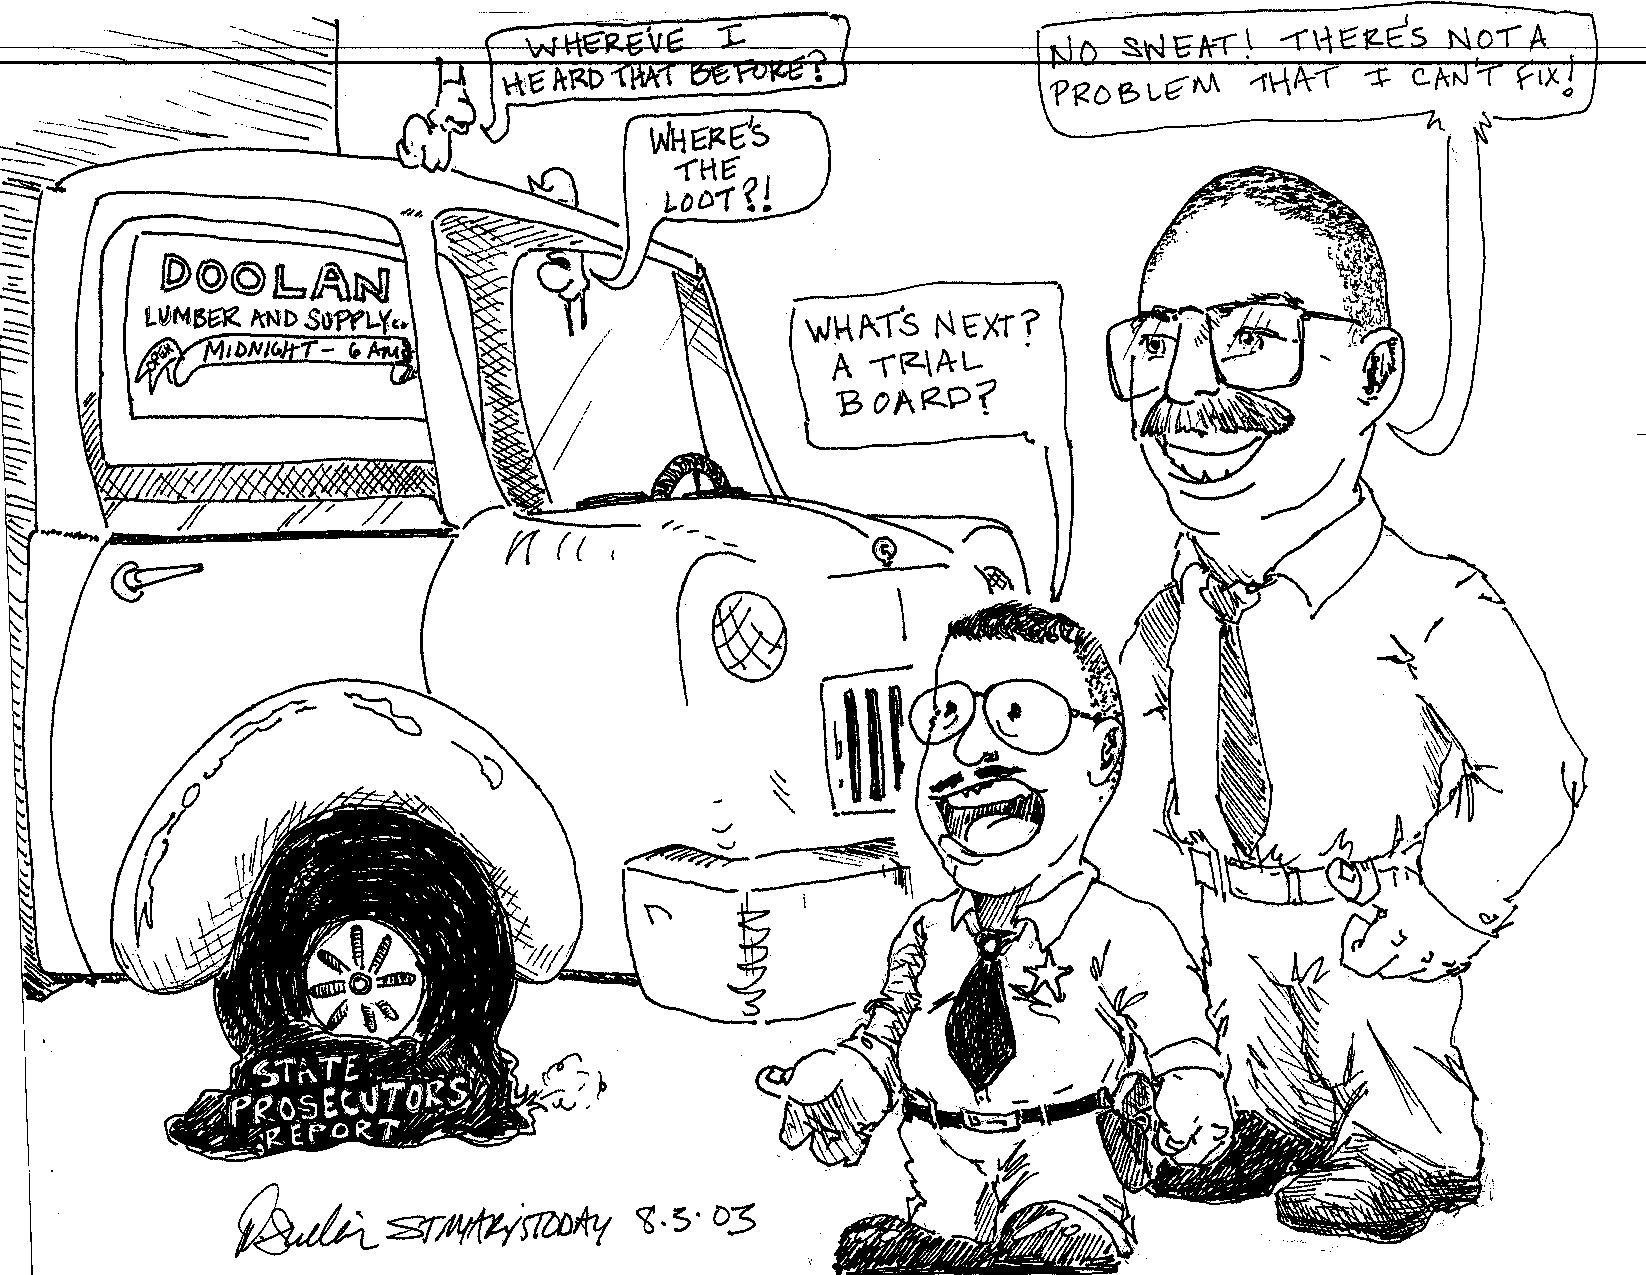 Where's the Loot Doolan's trial board